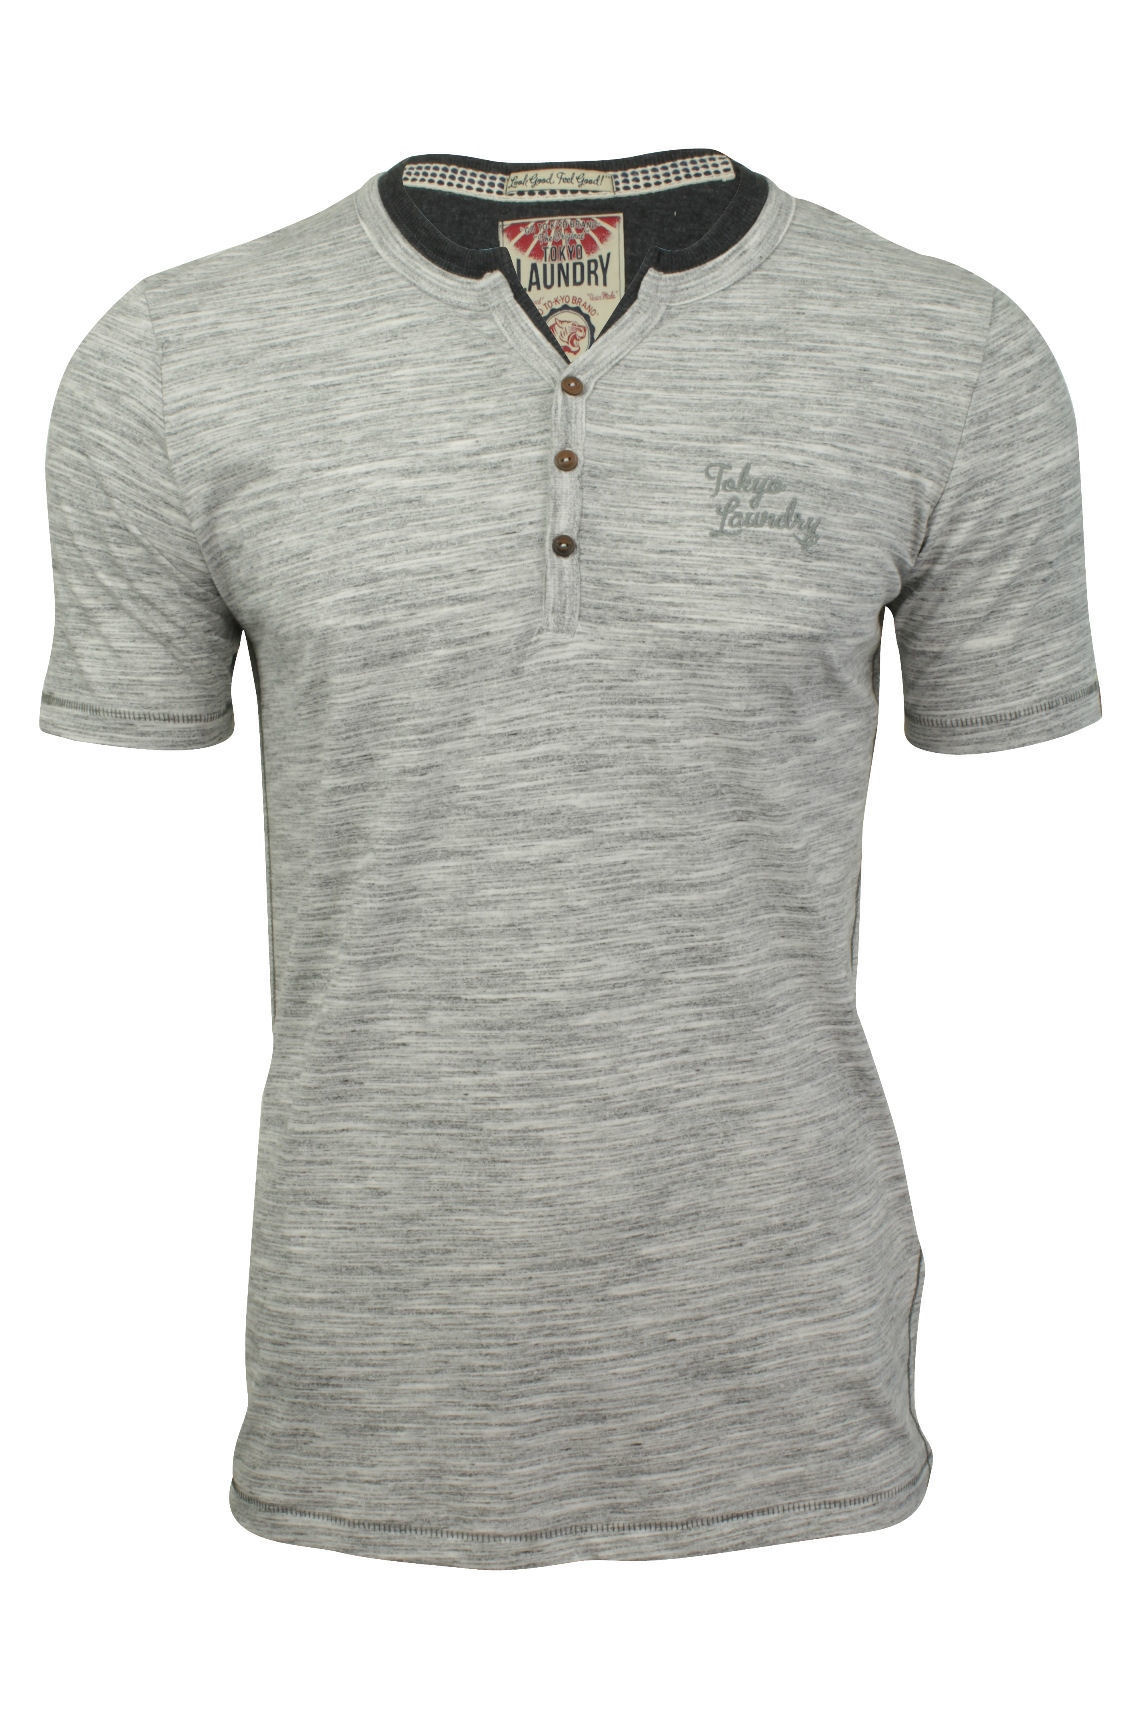 Mens grandad collar t shirt by tokyo laundry 39 buffalo cove Mens grandad collar shirt